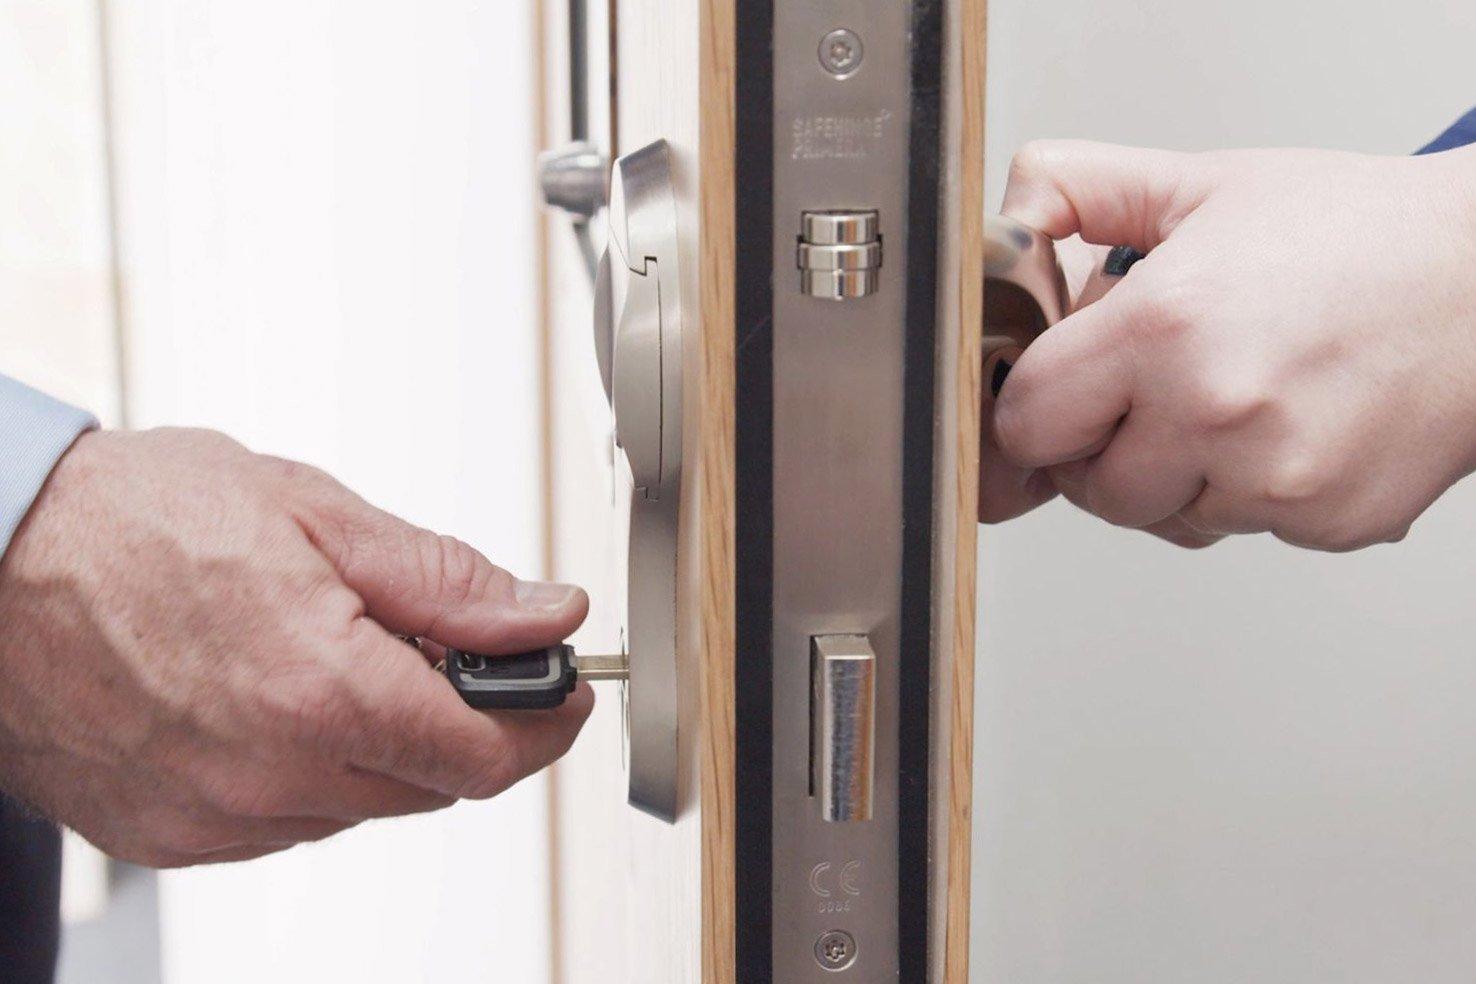 5-way SOS - key overriding the internal lock